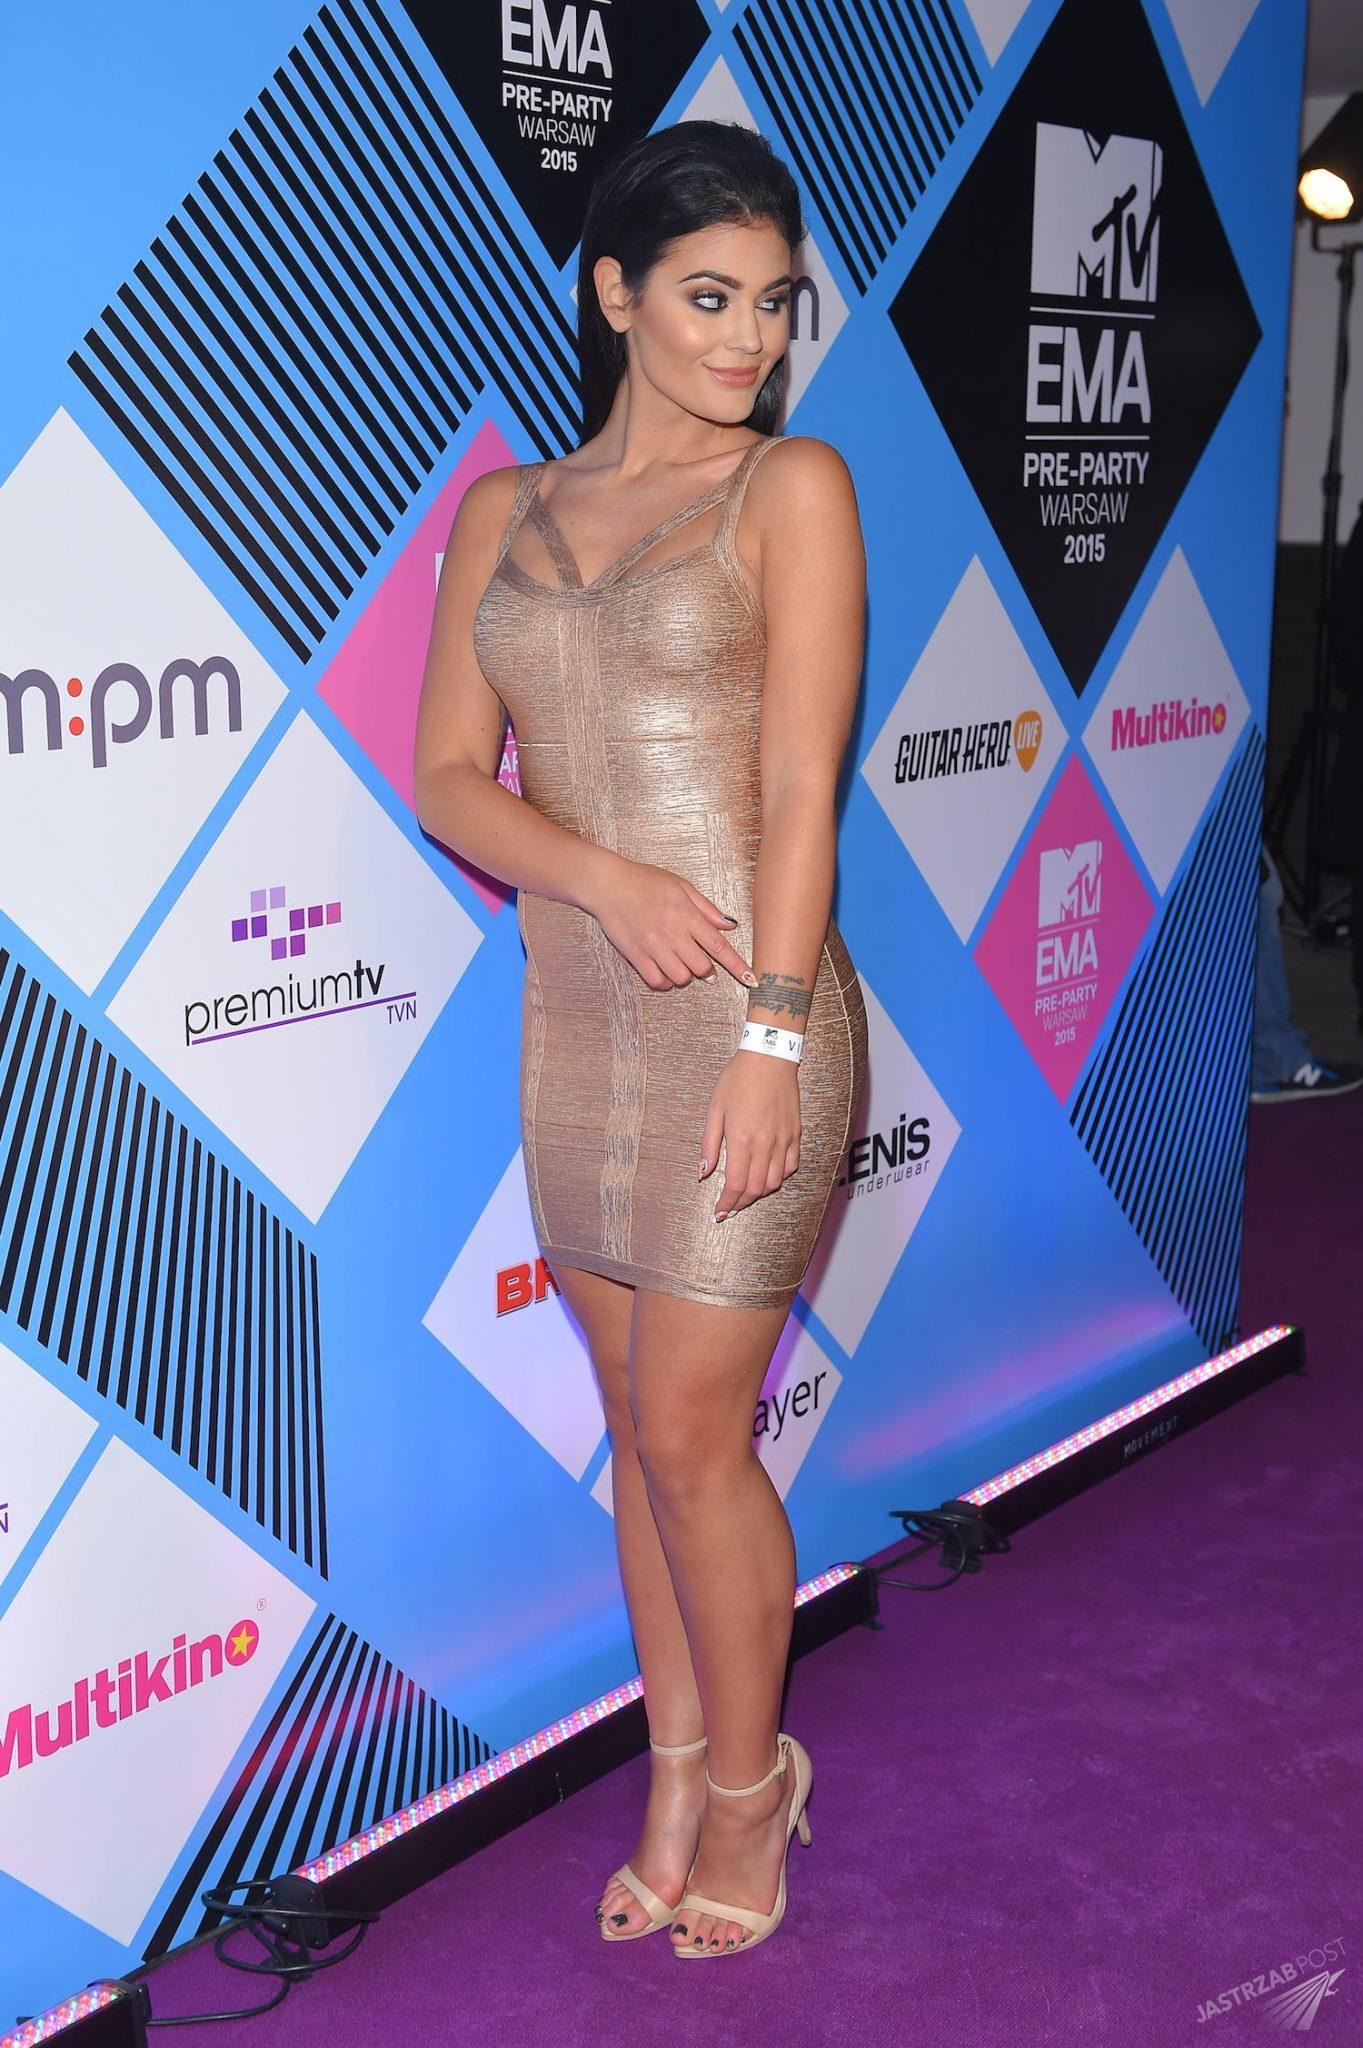 Honorata Skarbek Honey na MTV EMA 2015 Pre-party